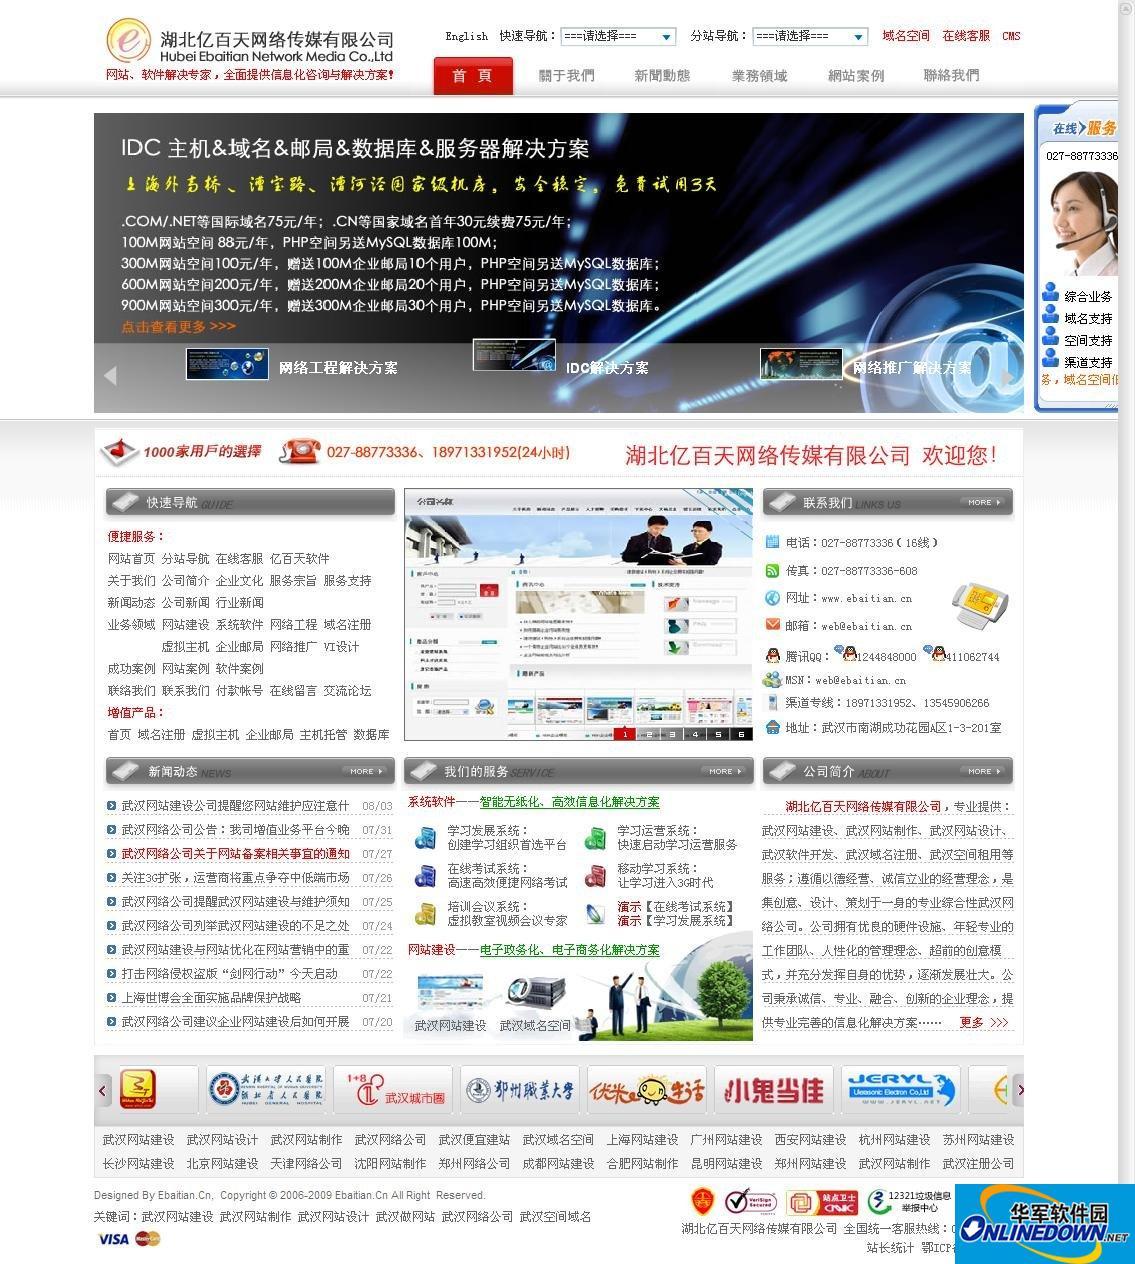 EbaitianCMS网站内容管理系统(企业版)2010 5.2 Bate2_0805